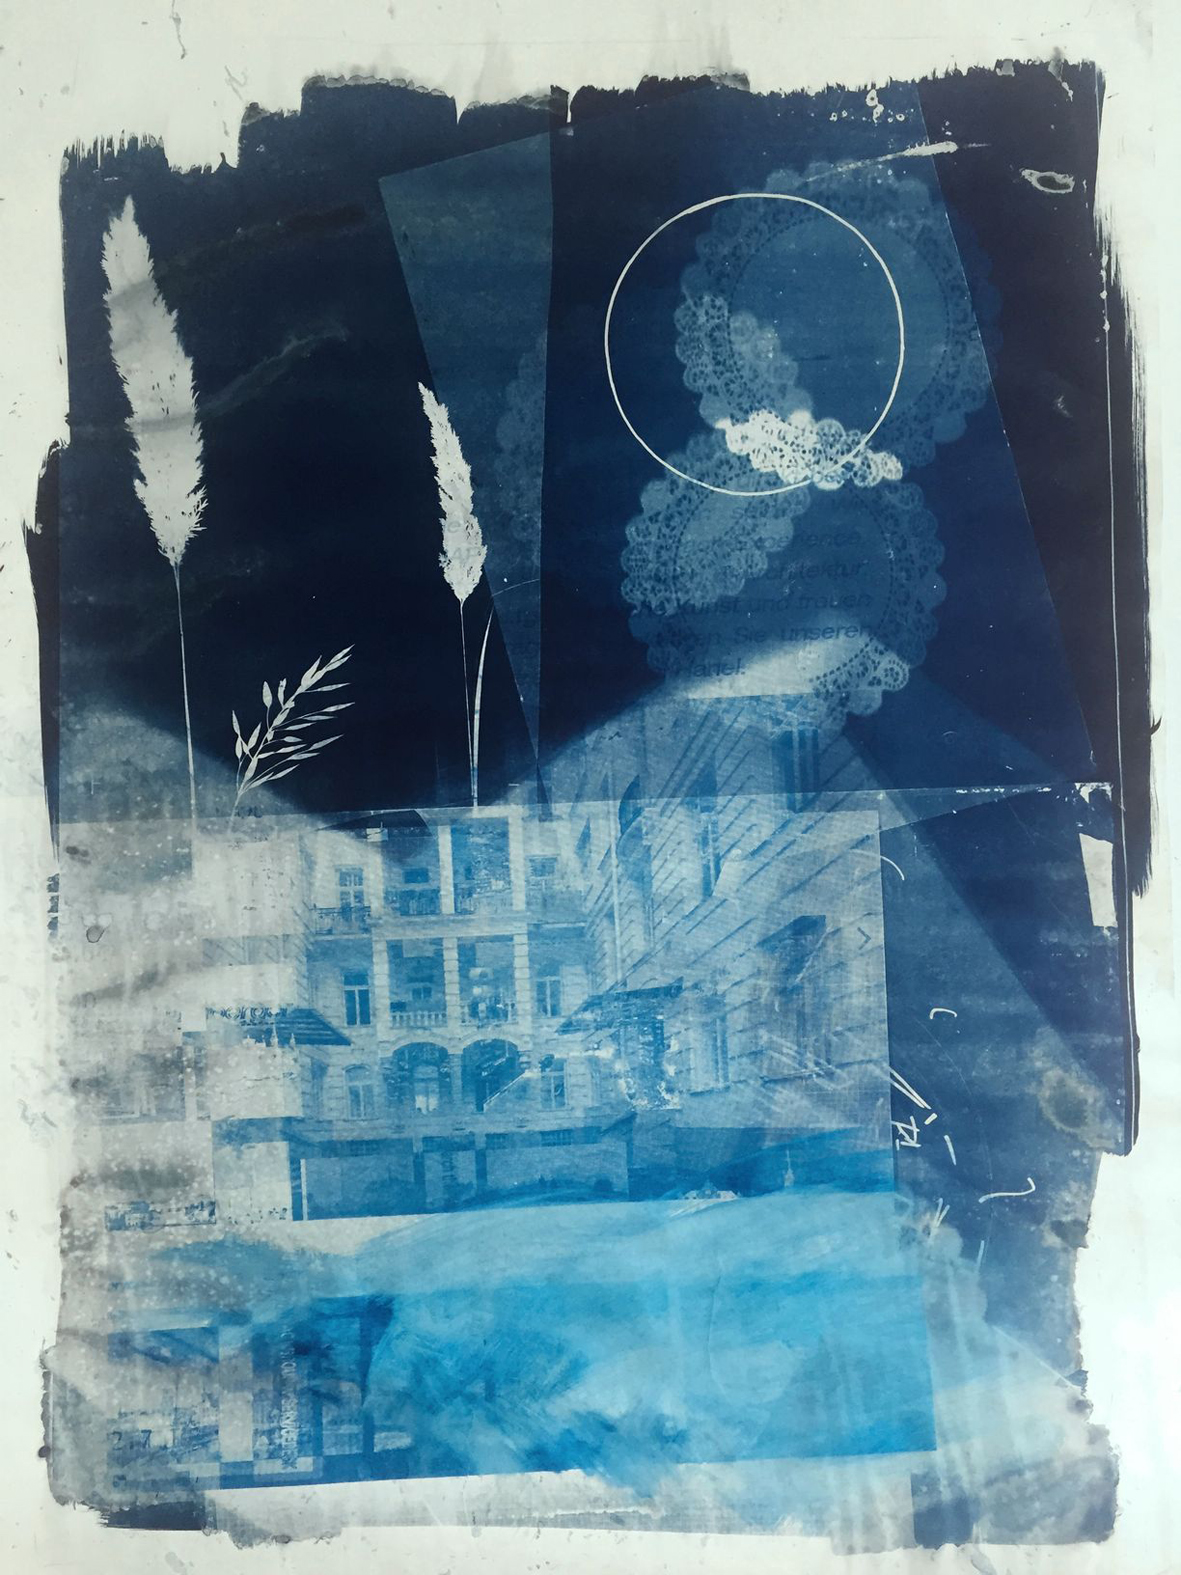 "Michael Wegerer  ""Along the Way to Utopia"" , 2018  Cyanotypie, Siebdruck,  100x150cm  (c) Michael Wegerer"